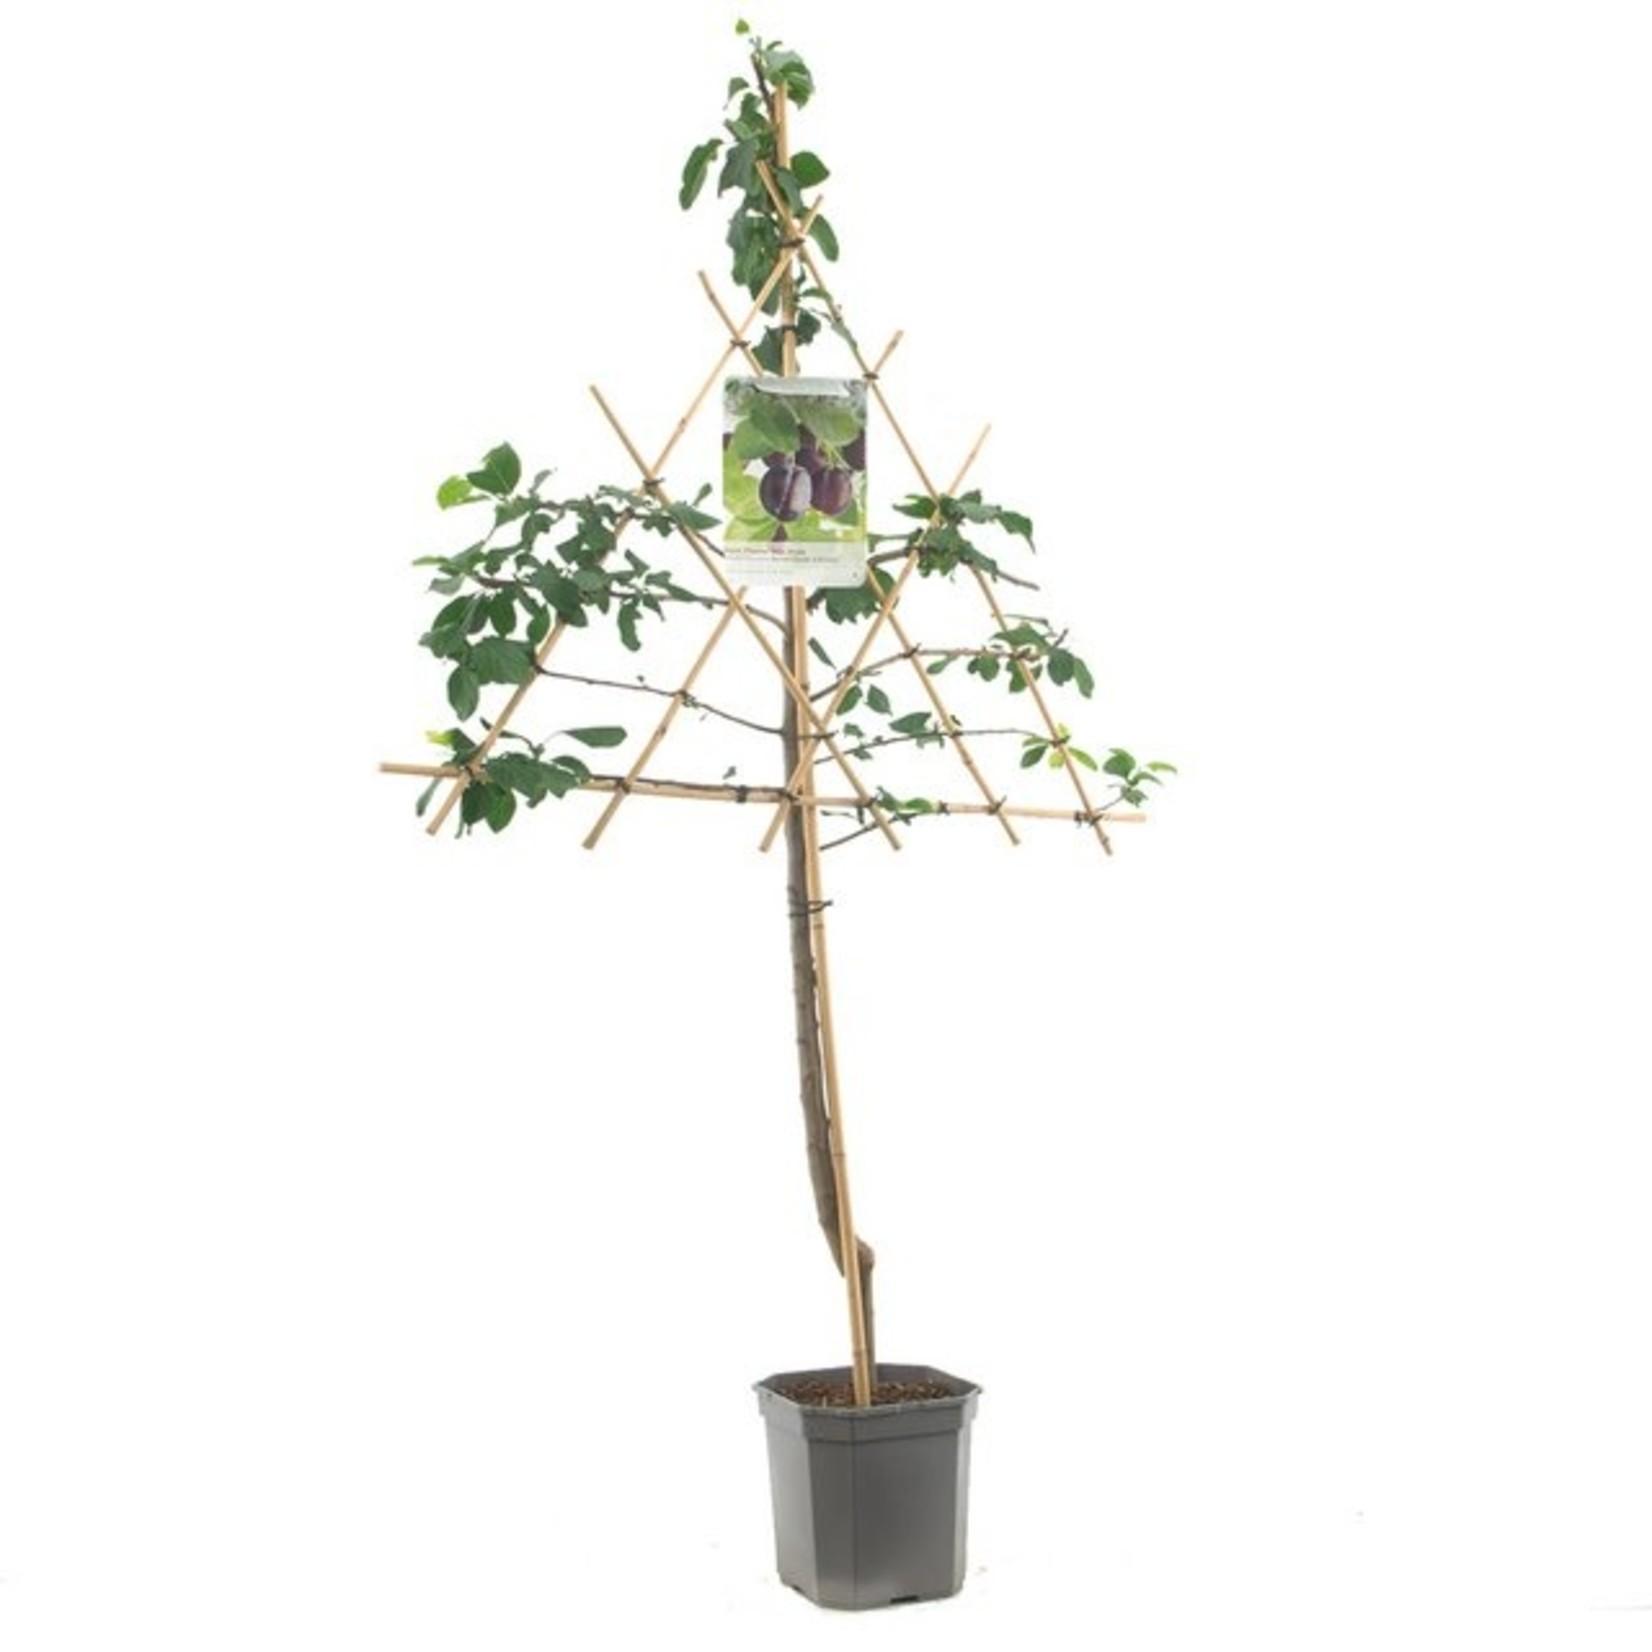 Leivorm de Fruithof Prunus domestica 'Reine Claude d'Althan'